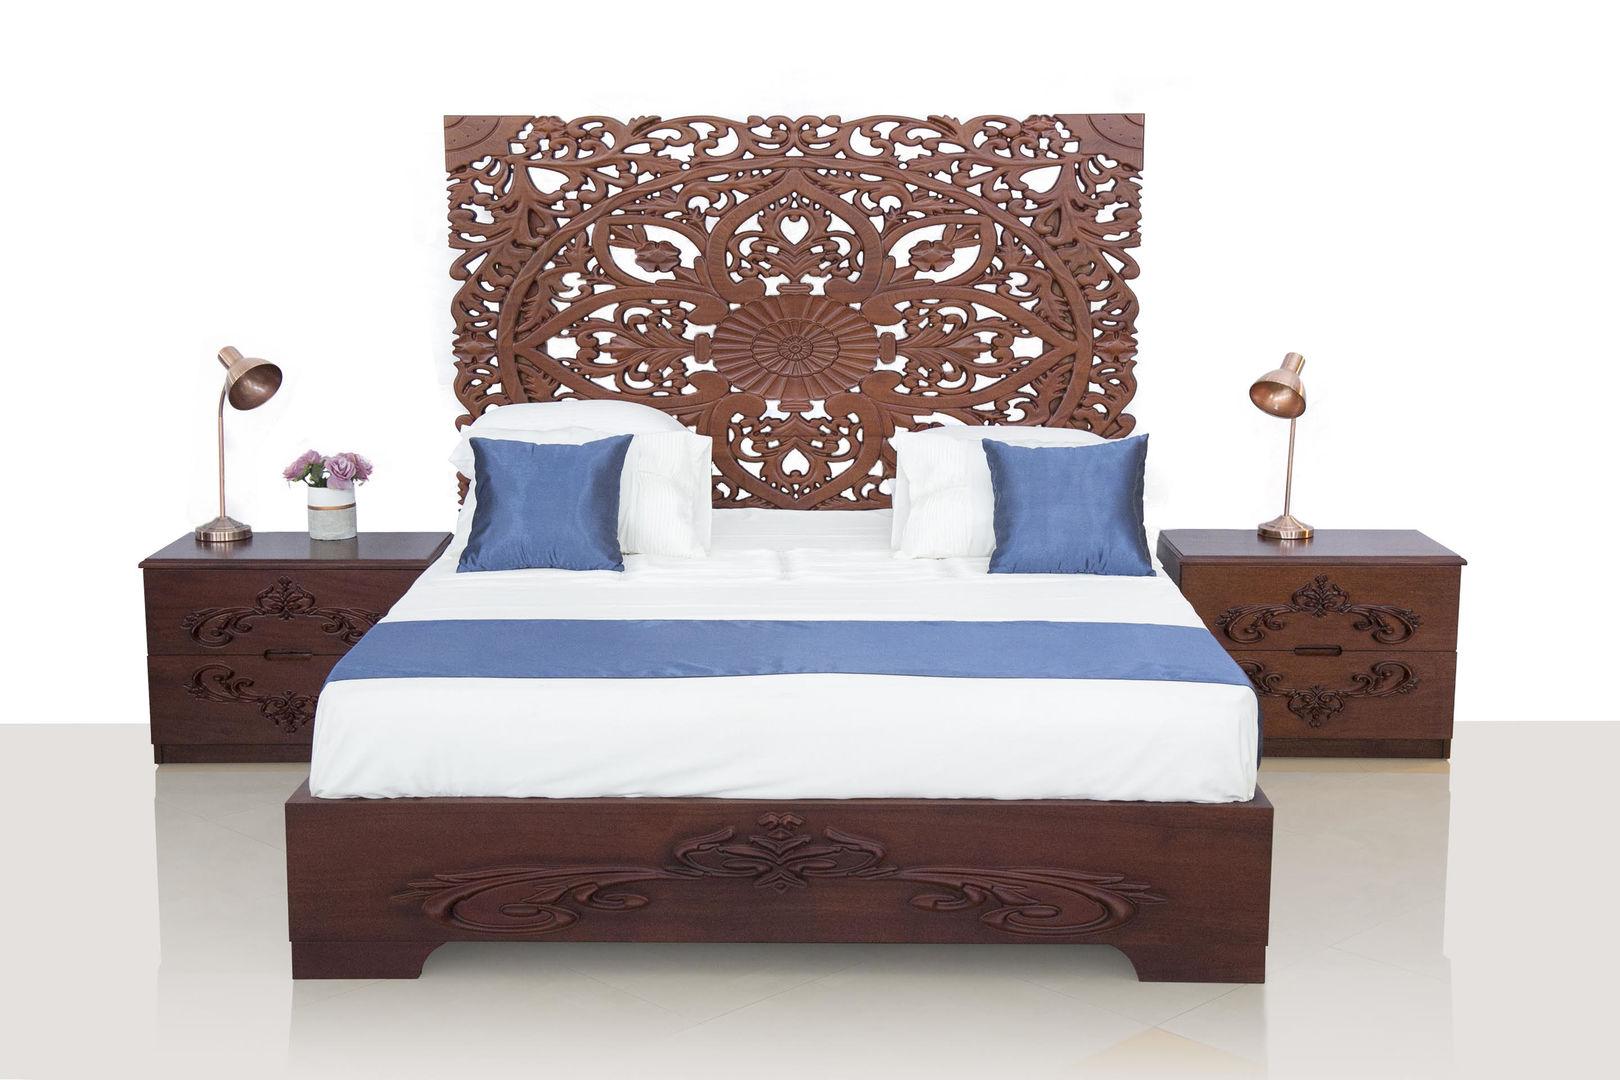 Royal Kitchens and Furniture - High Quality Custom Designed Furniture